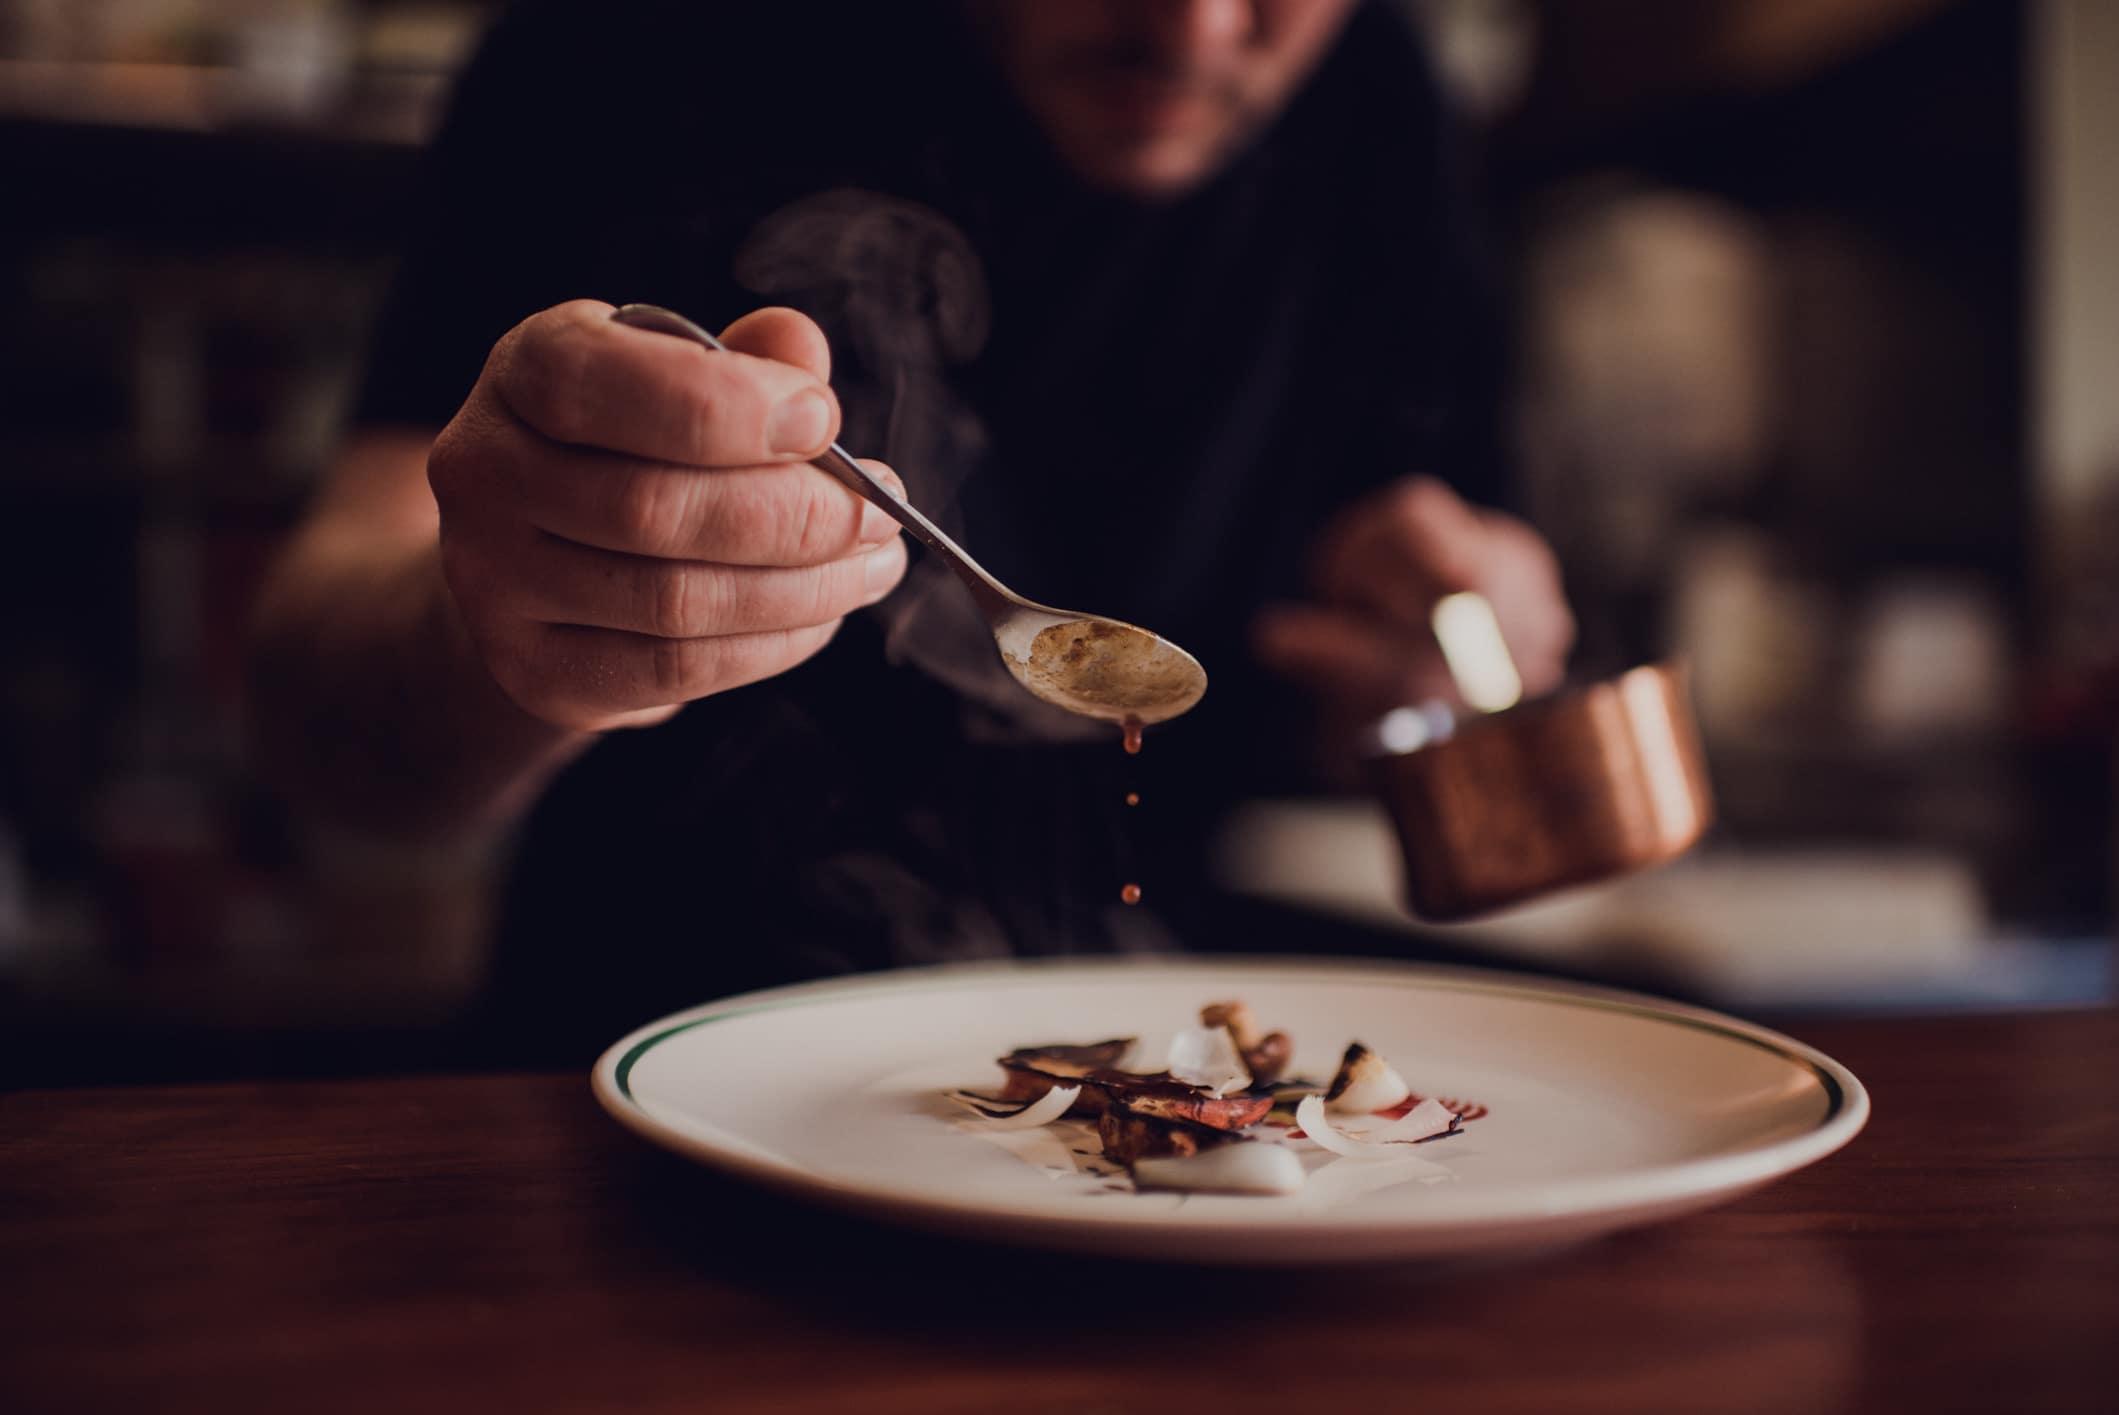 The Local Dish reviews MÄS tasting menu restaurant in Ashland, Oregon.